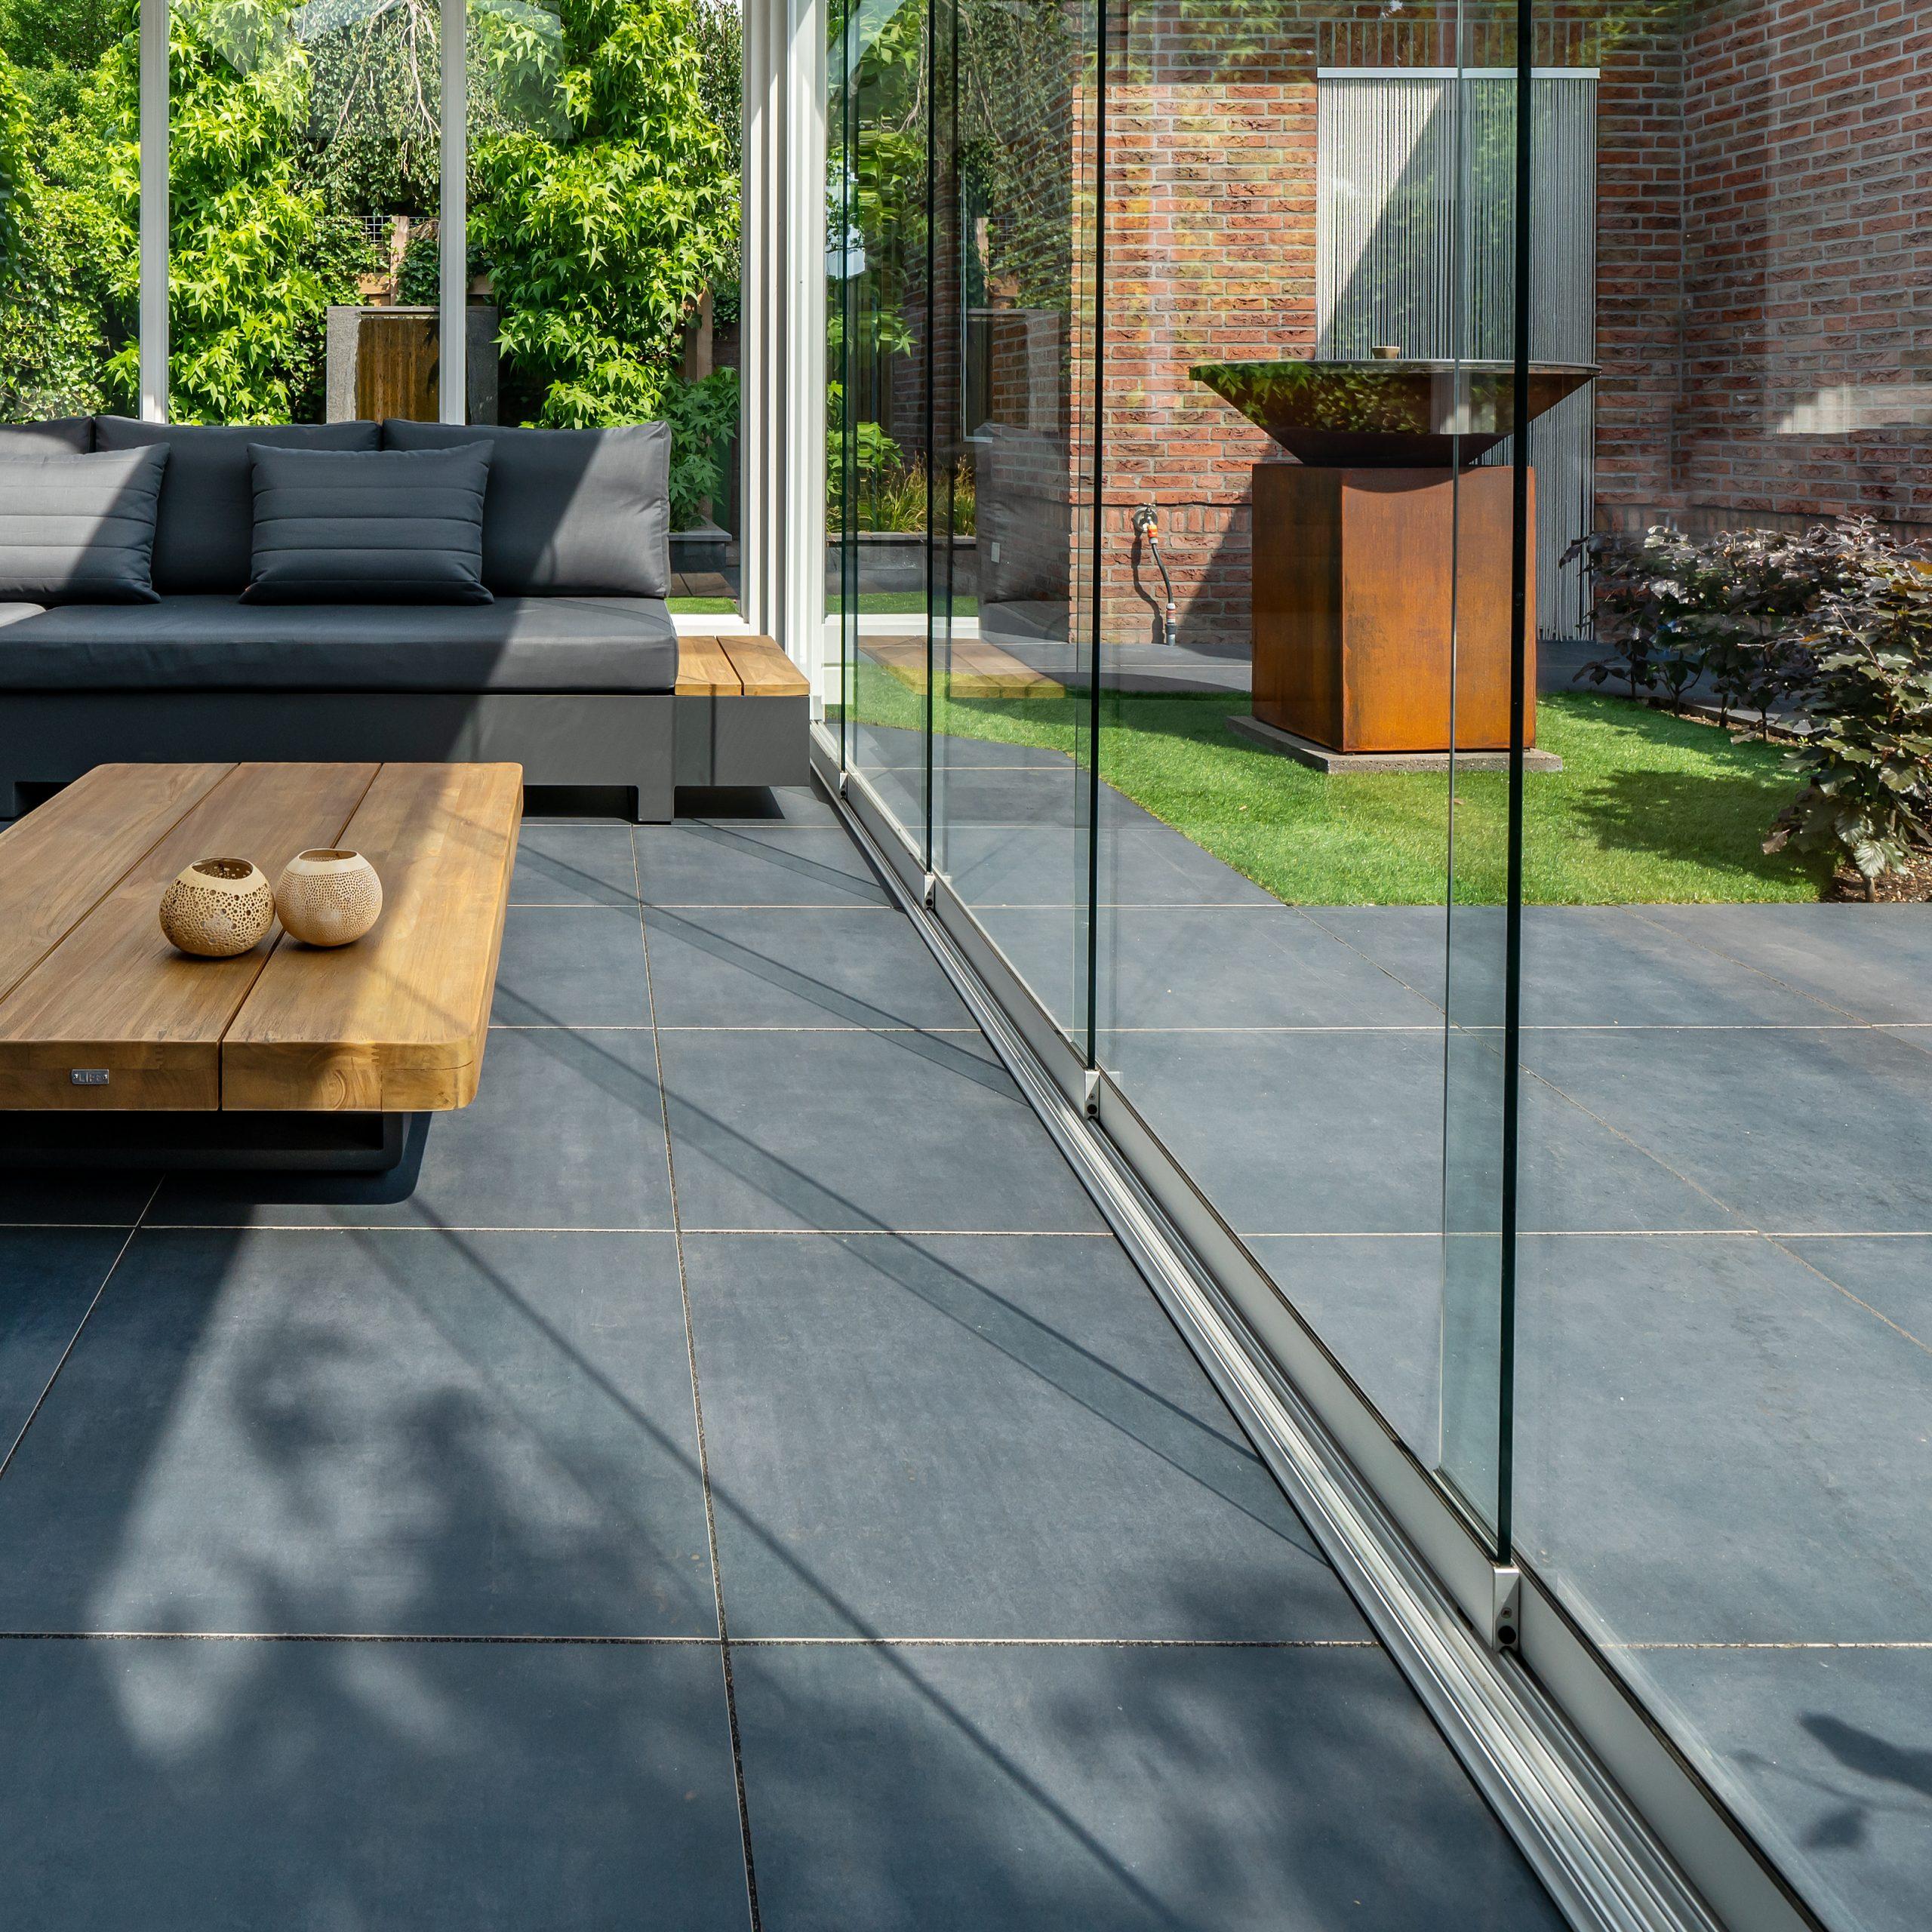 Kuppens fotografie 5000d scaled - klassieke veranda